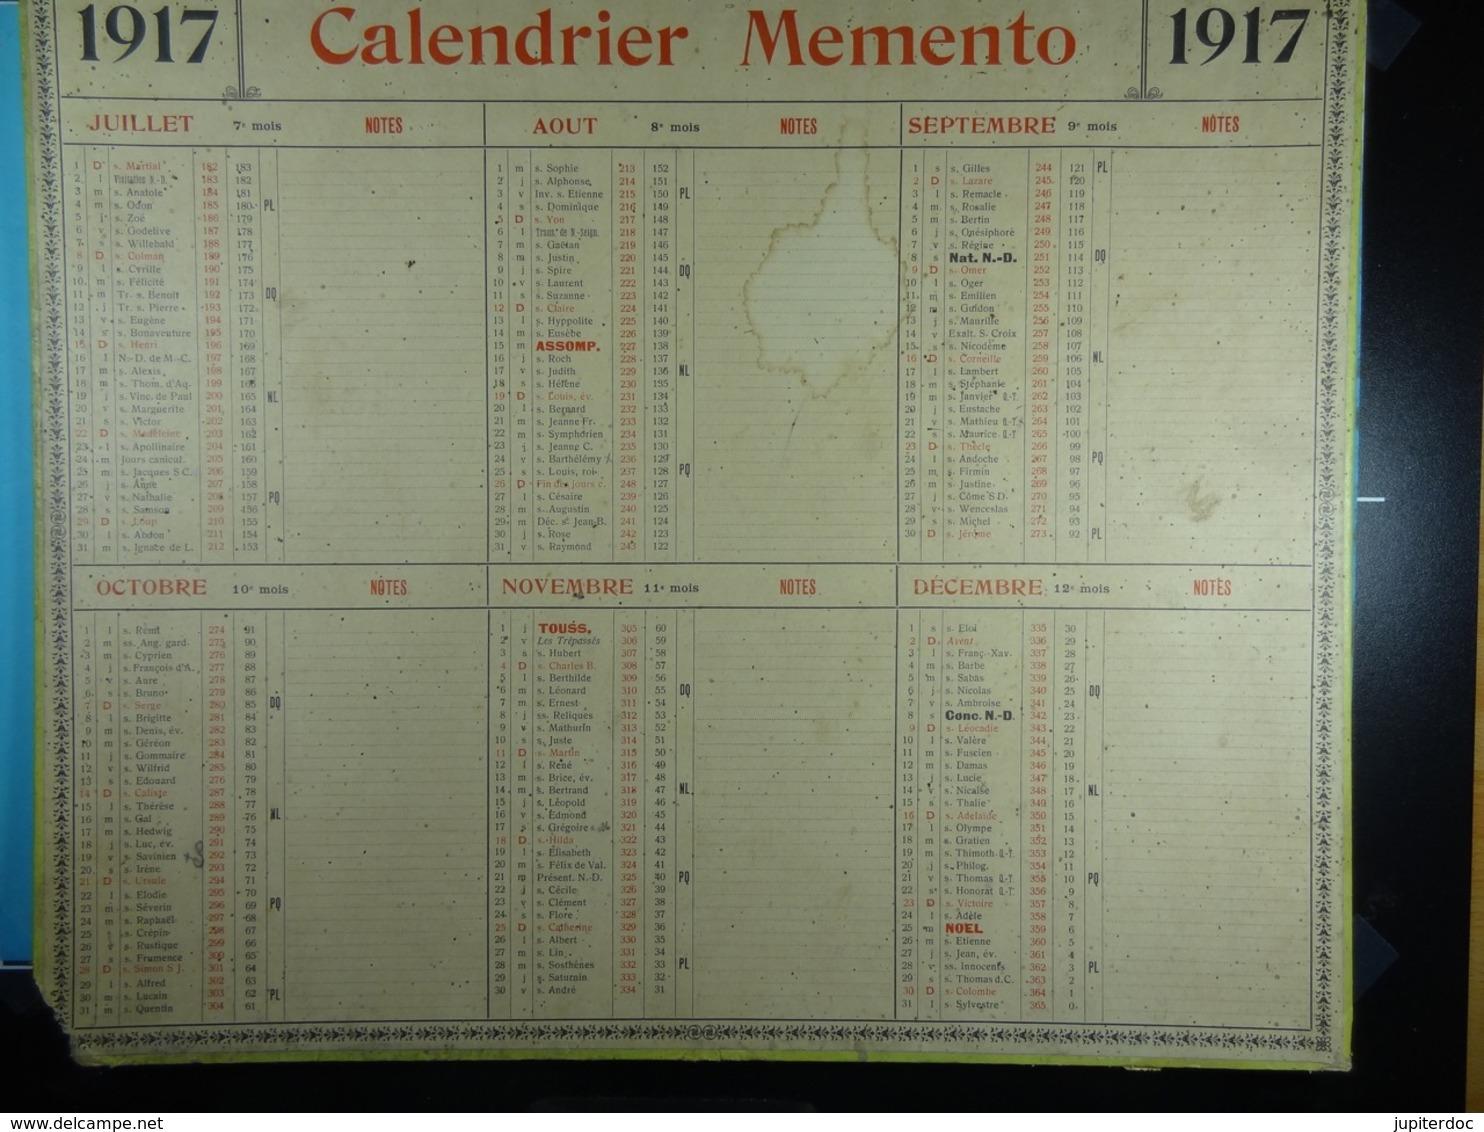 Calendrier Memento 1917 Sur Carton 2 Faces (Format : 42,5 Cm X 34,5 Cm) - Calendari